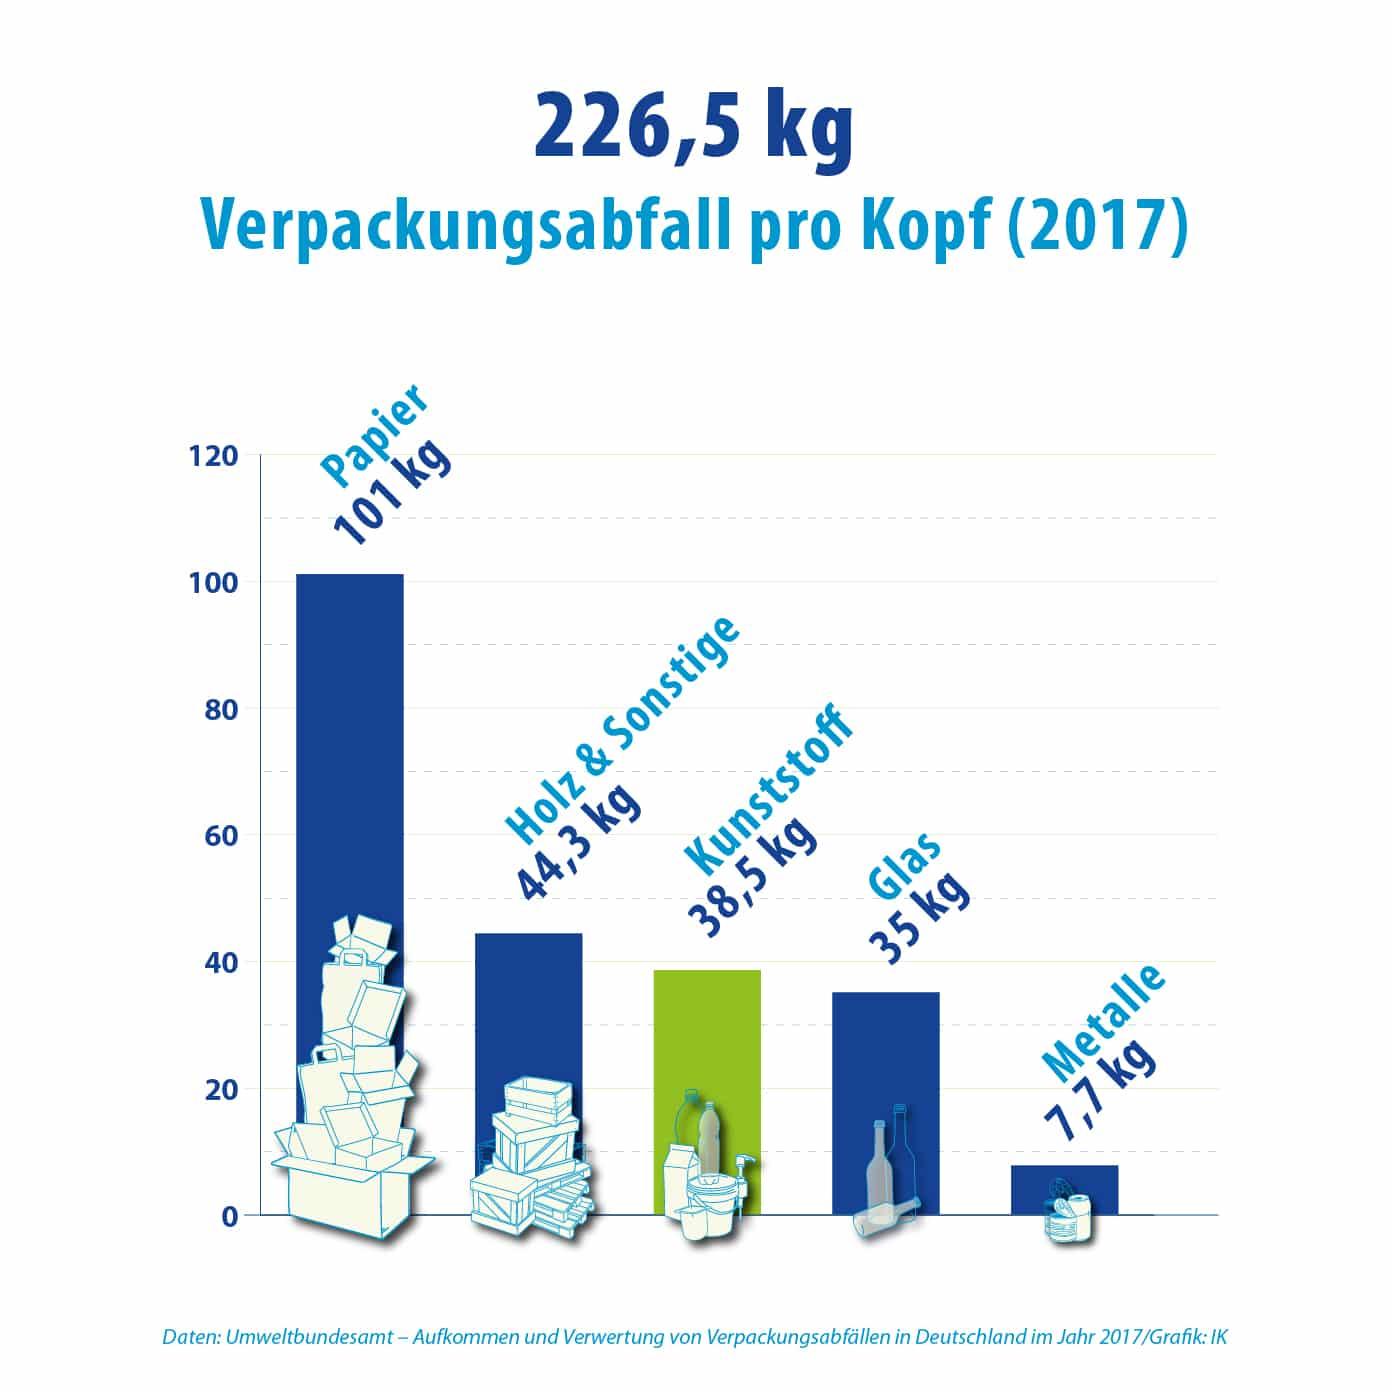 Verpackungsabfall Pro Kopf Materialien Consumer Grafik BlueGreen Icons Web